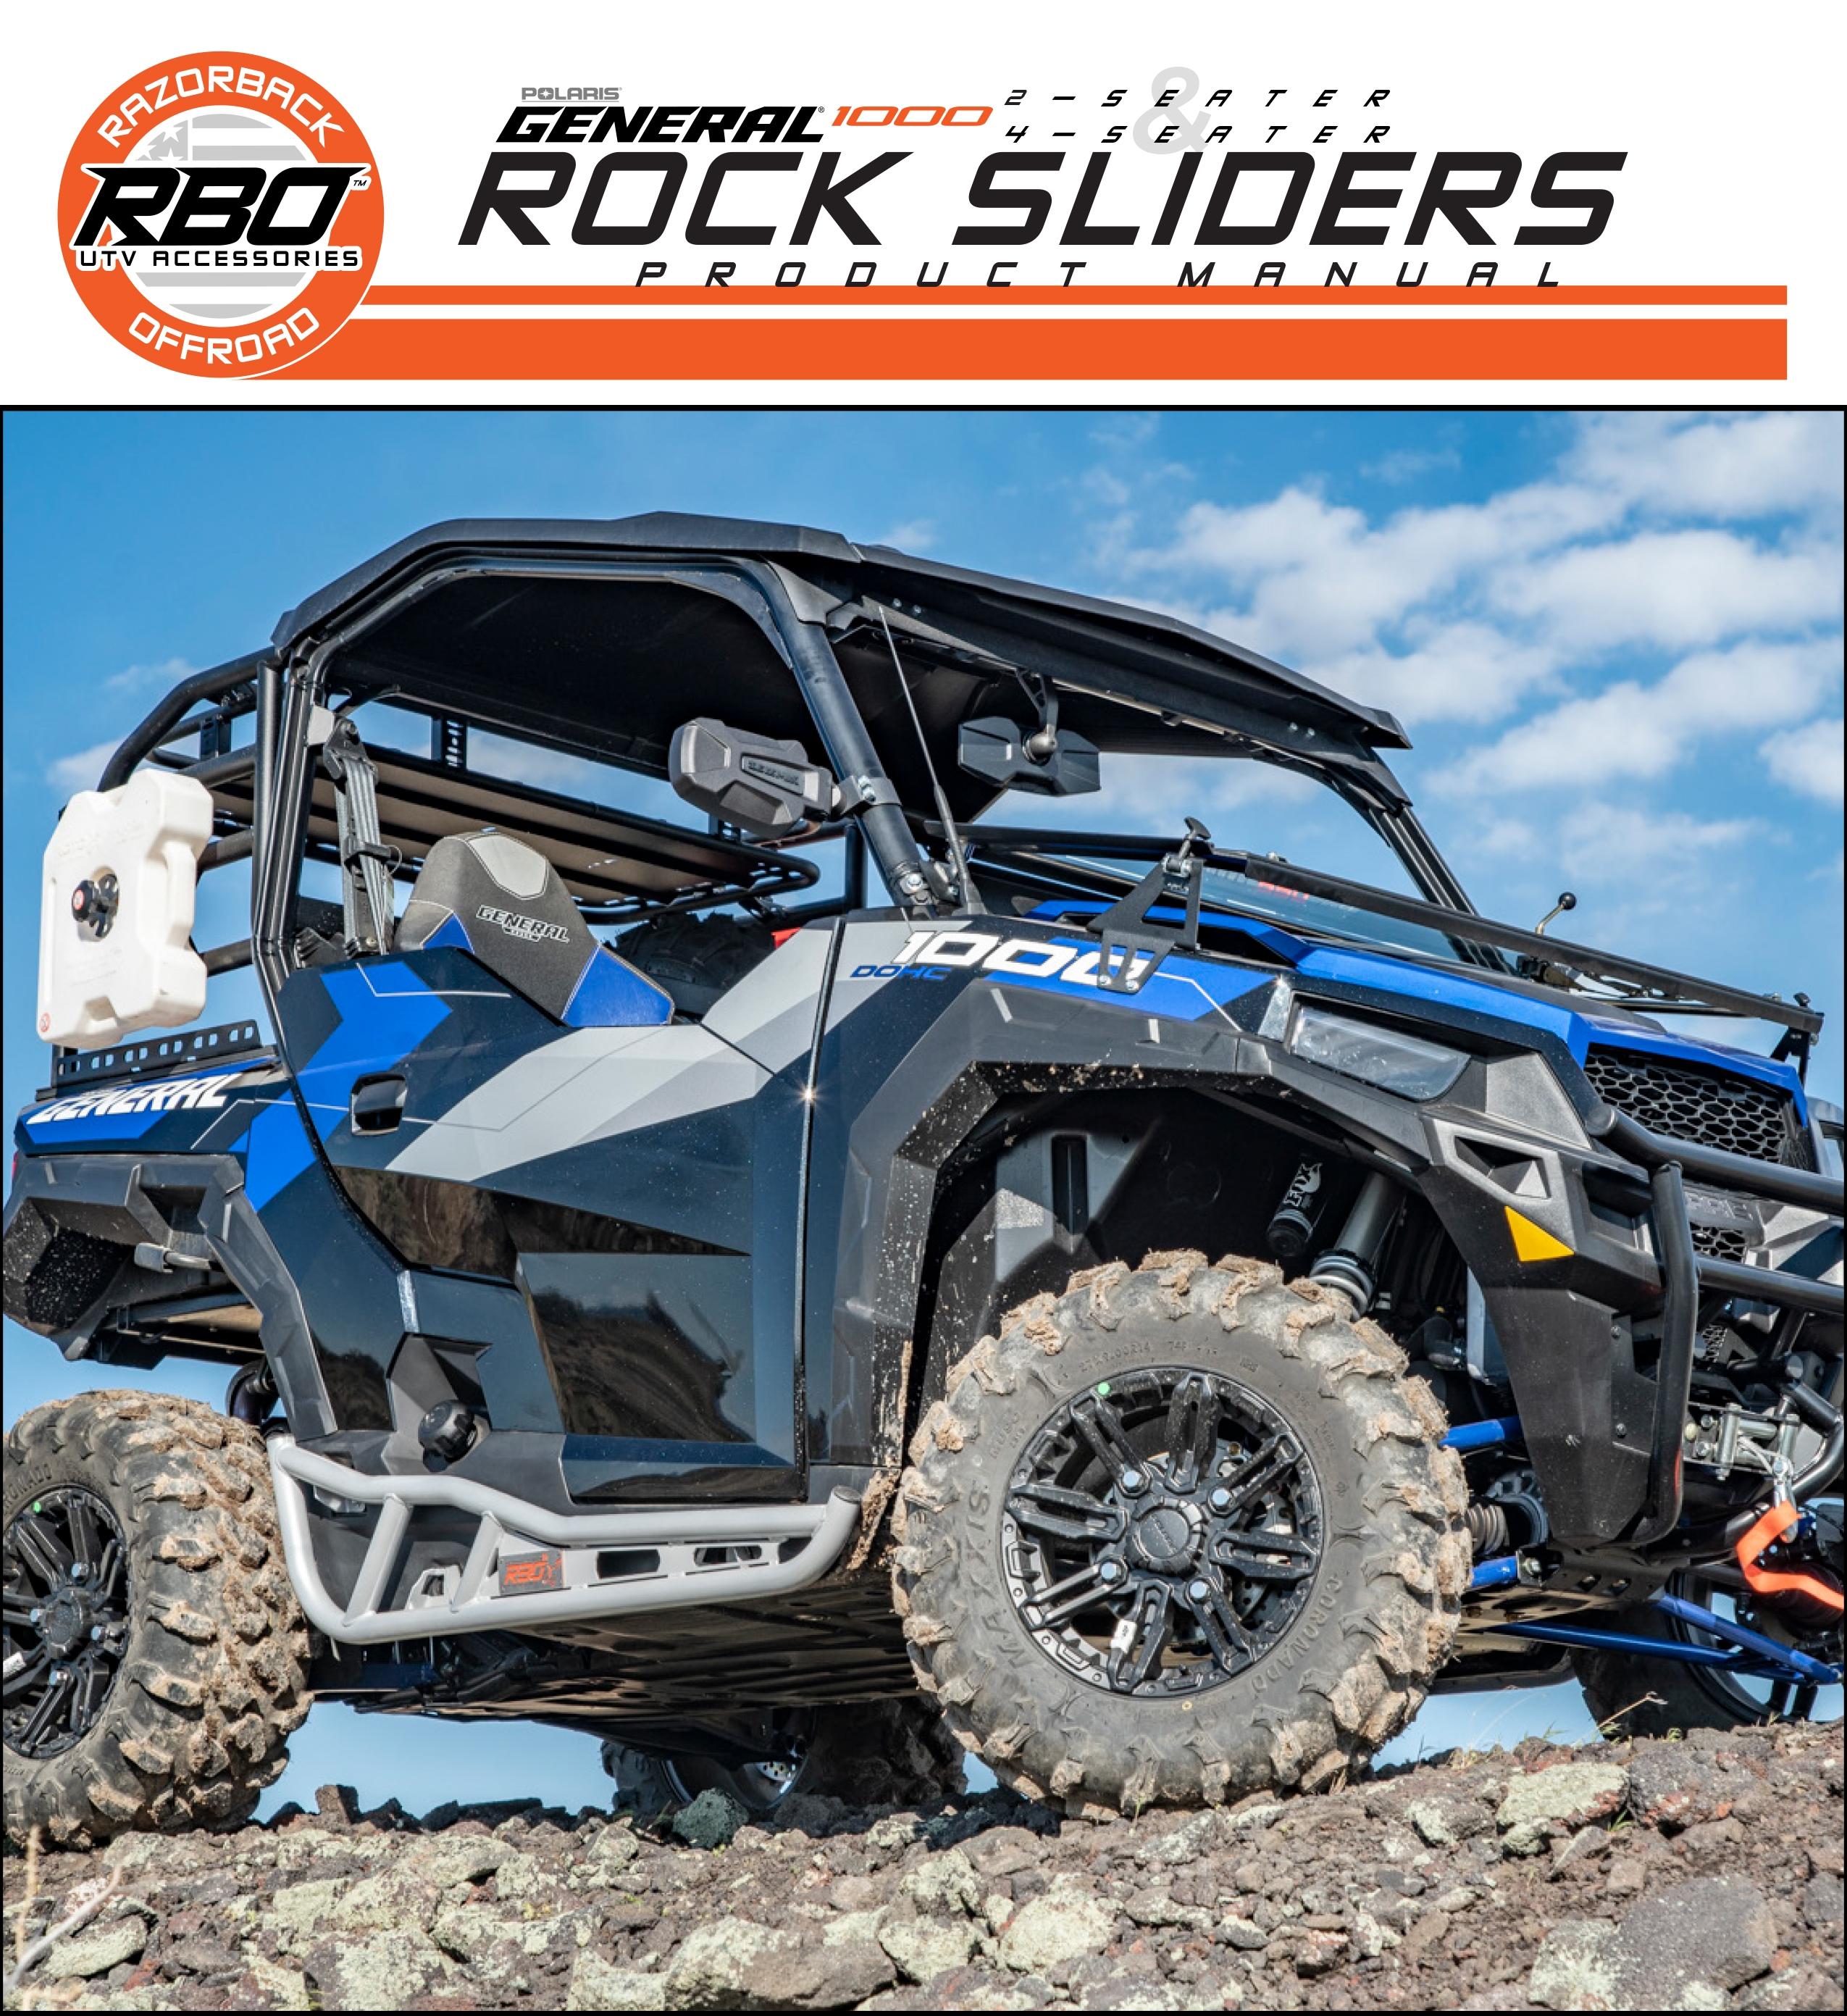 RBO Polaris General 1000 Rock Sliders Product Manual